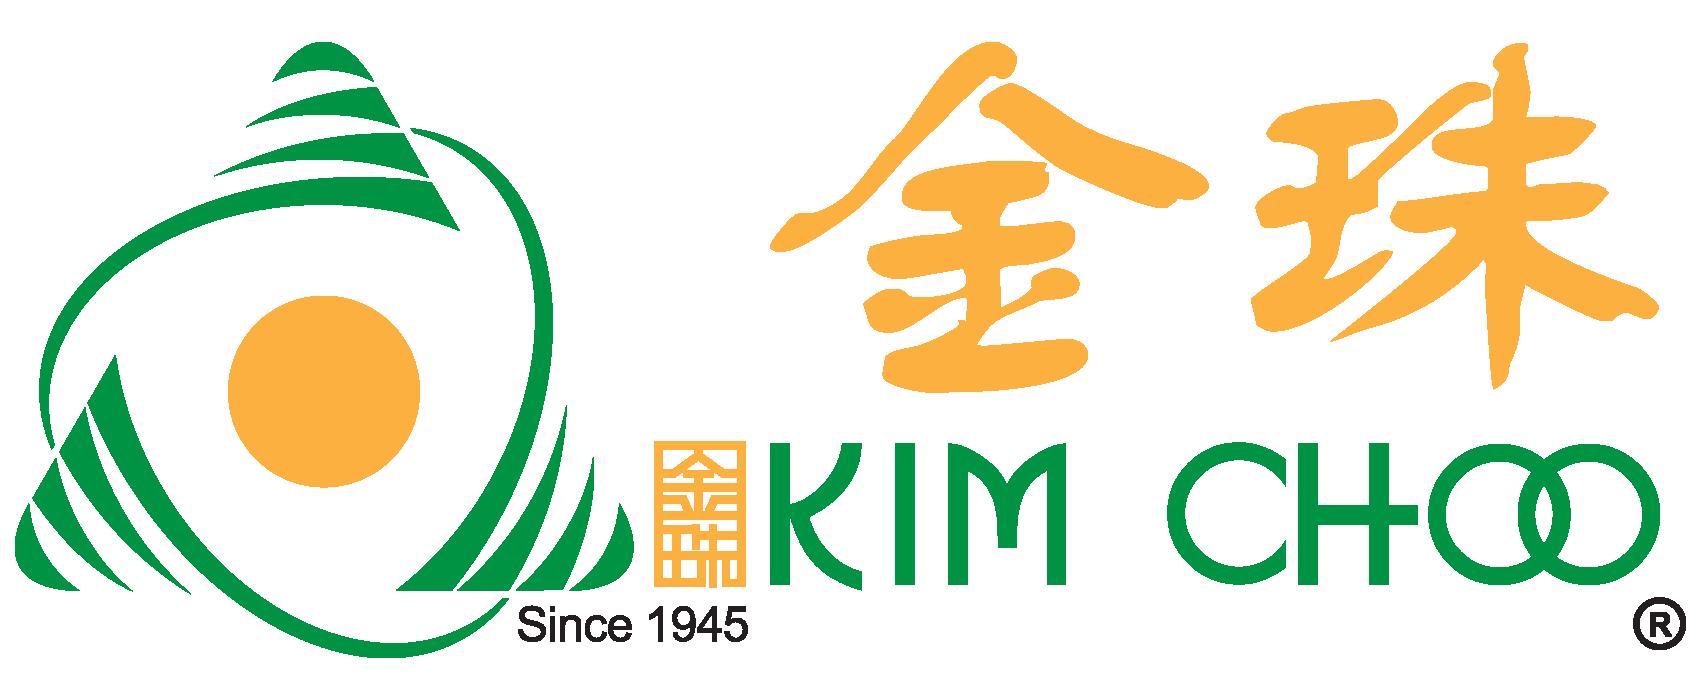 Kim Choo Kueh Chang Pte Ltd